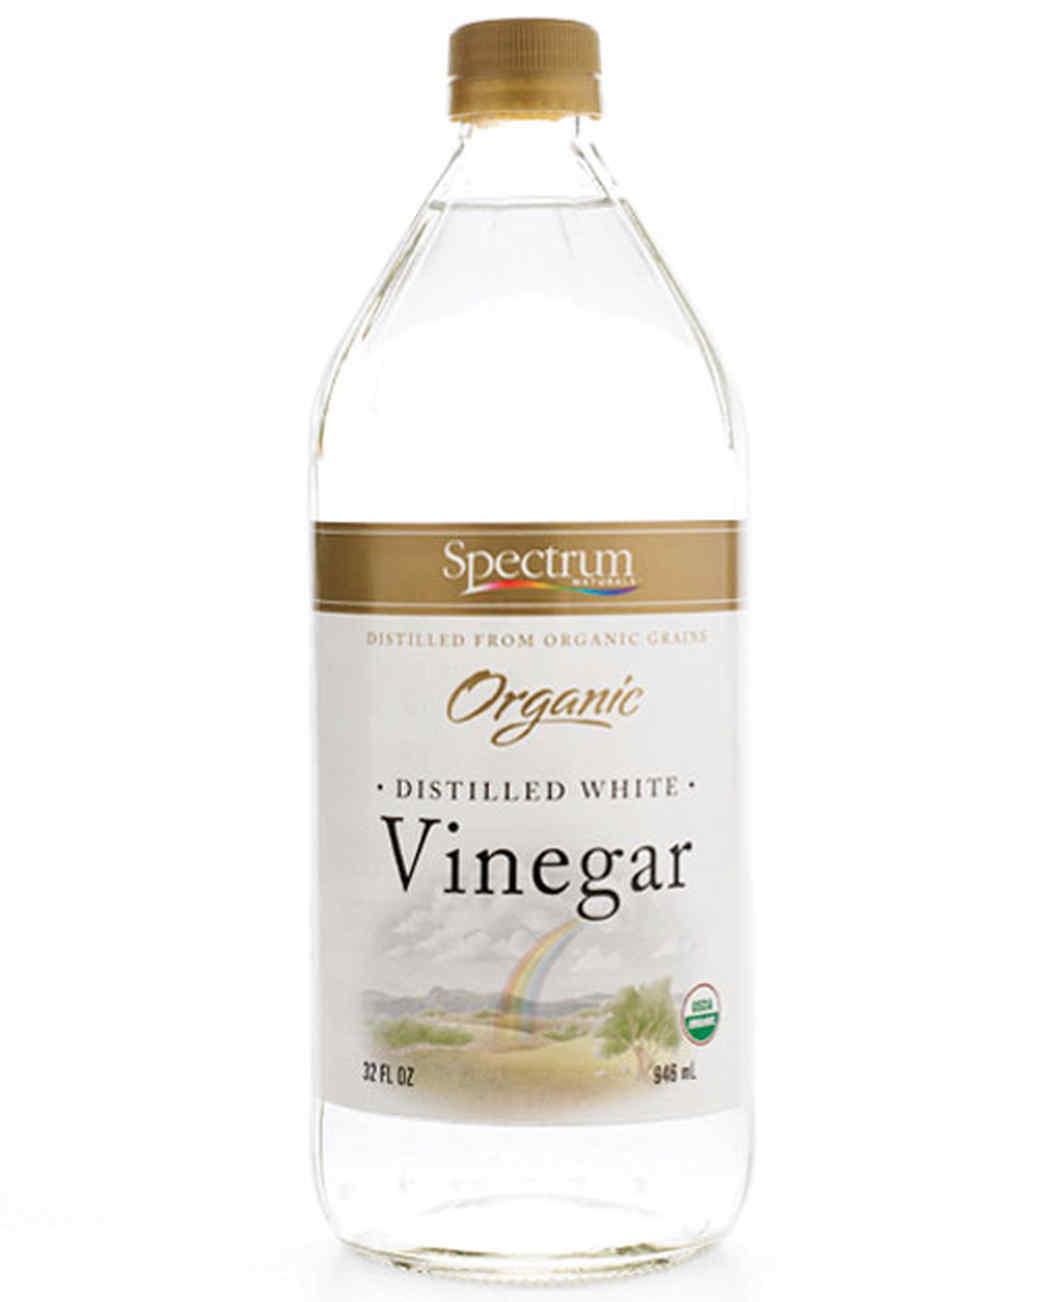 mld103595_0208_vinegars.jpg